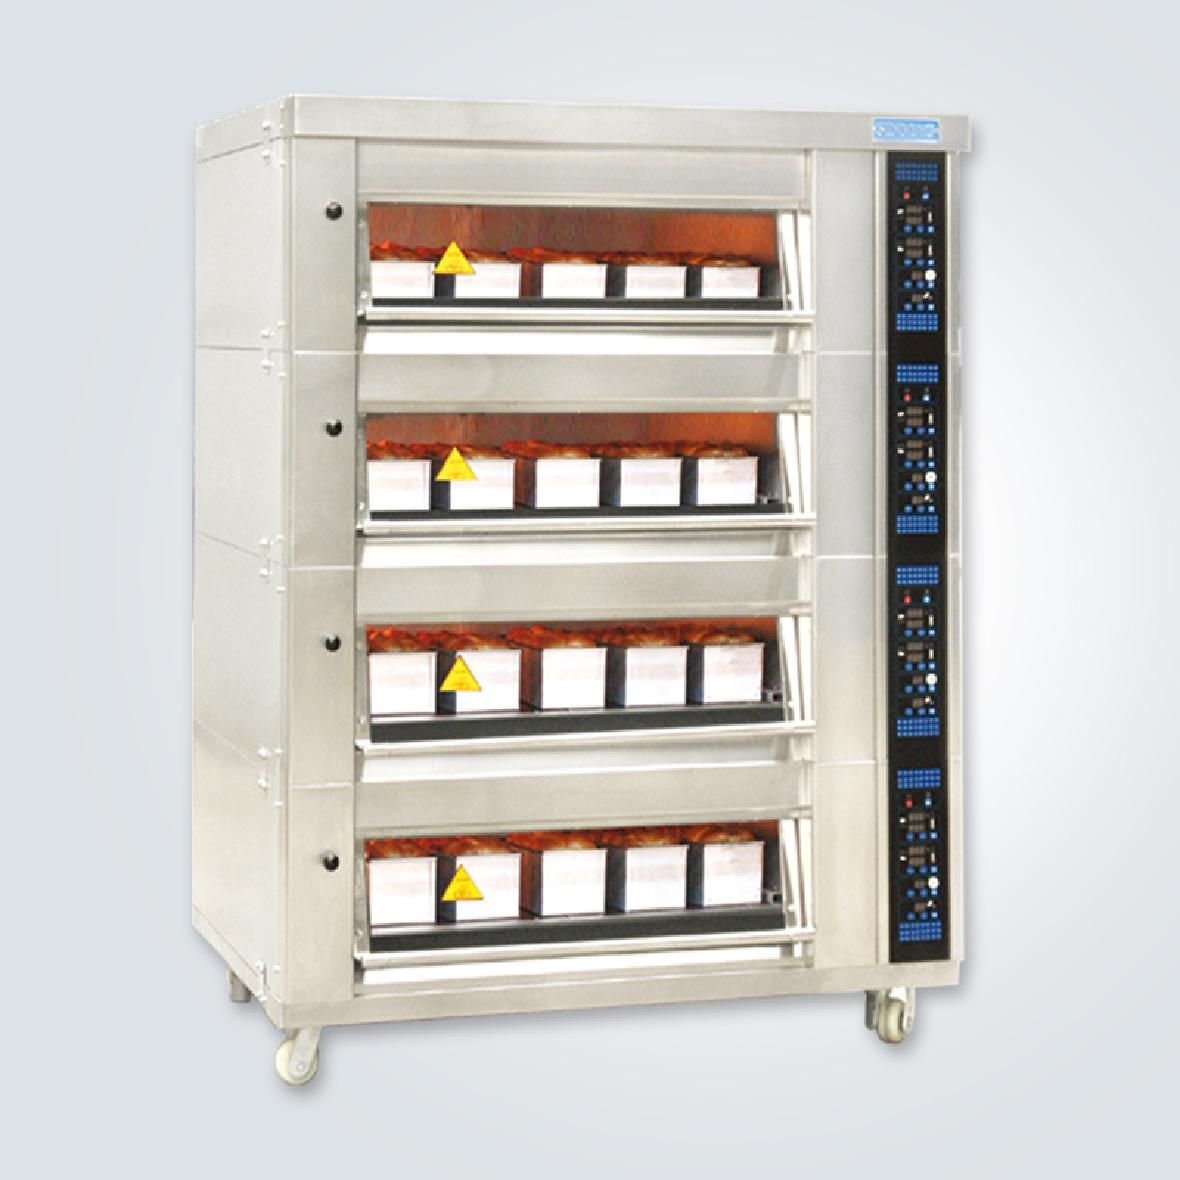 歐洲式電烤爐 MB-644F